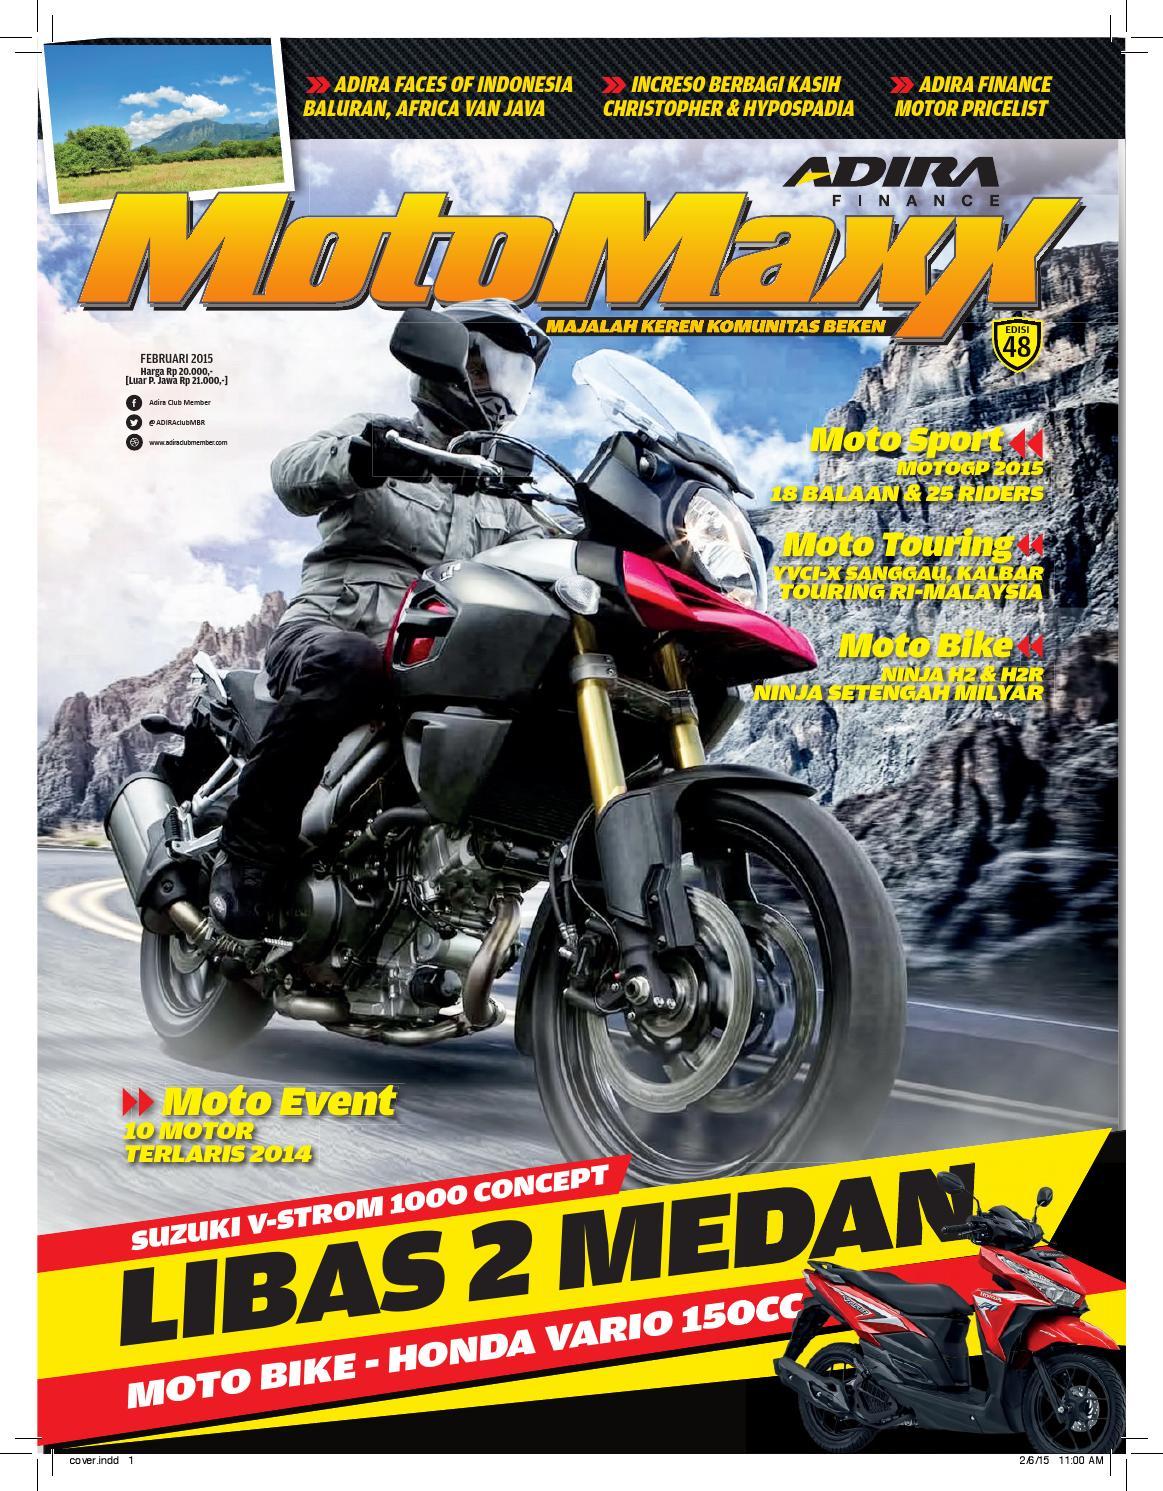 Motomaxx 02 2015 By Adira Member Issuu Yamaha Fino 125 Grande Otr Jabodetabek Banten Biru